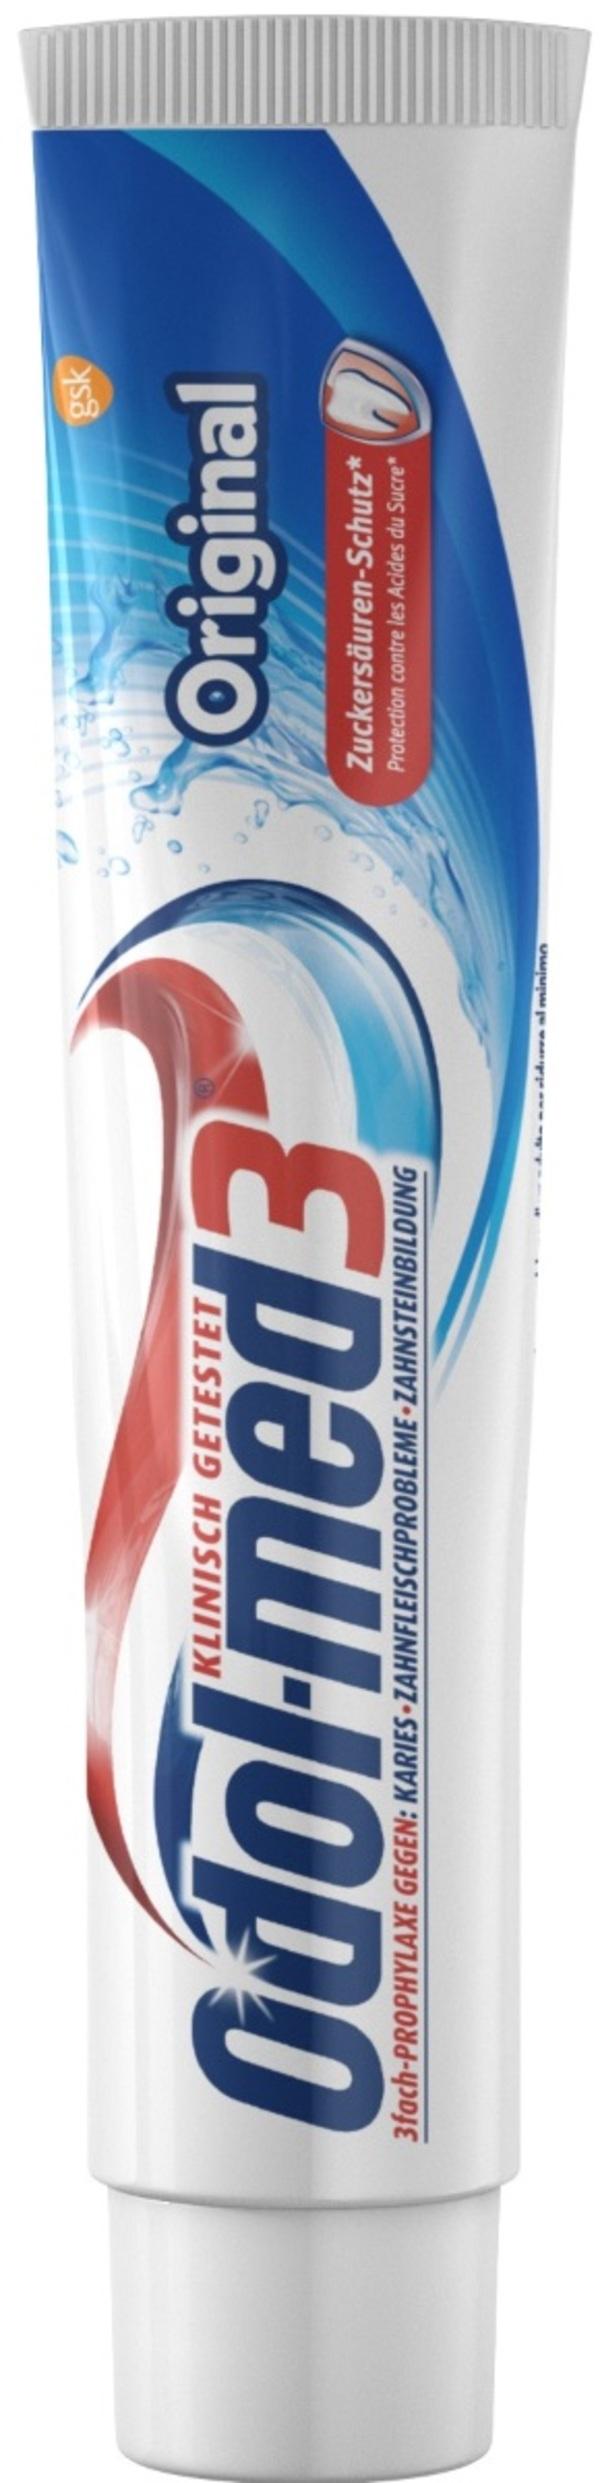 Odol Med 3 Zahncreme Original 75 ml